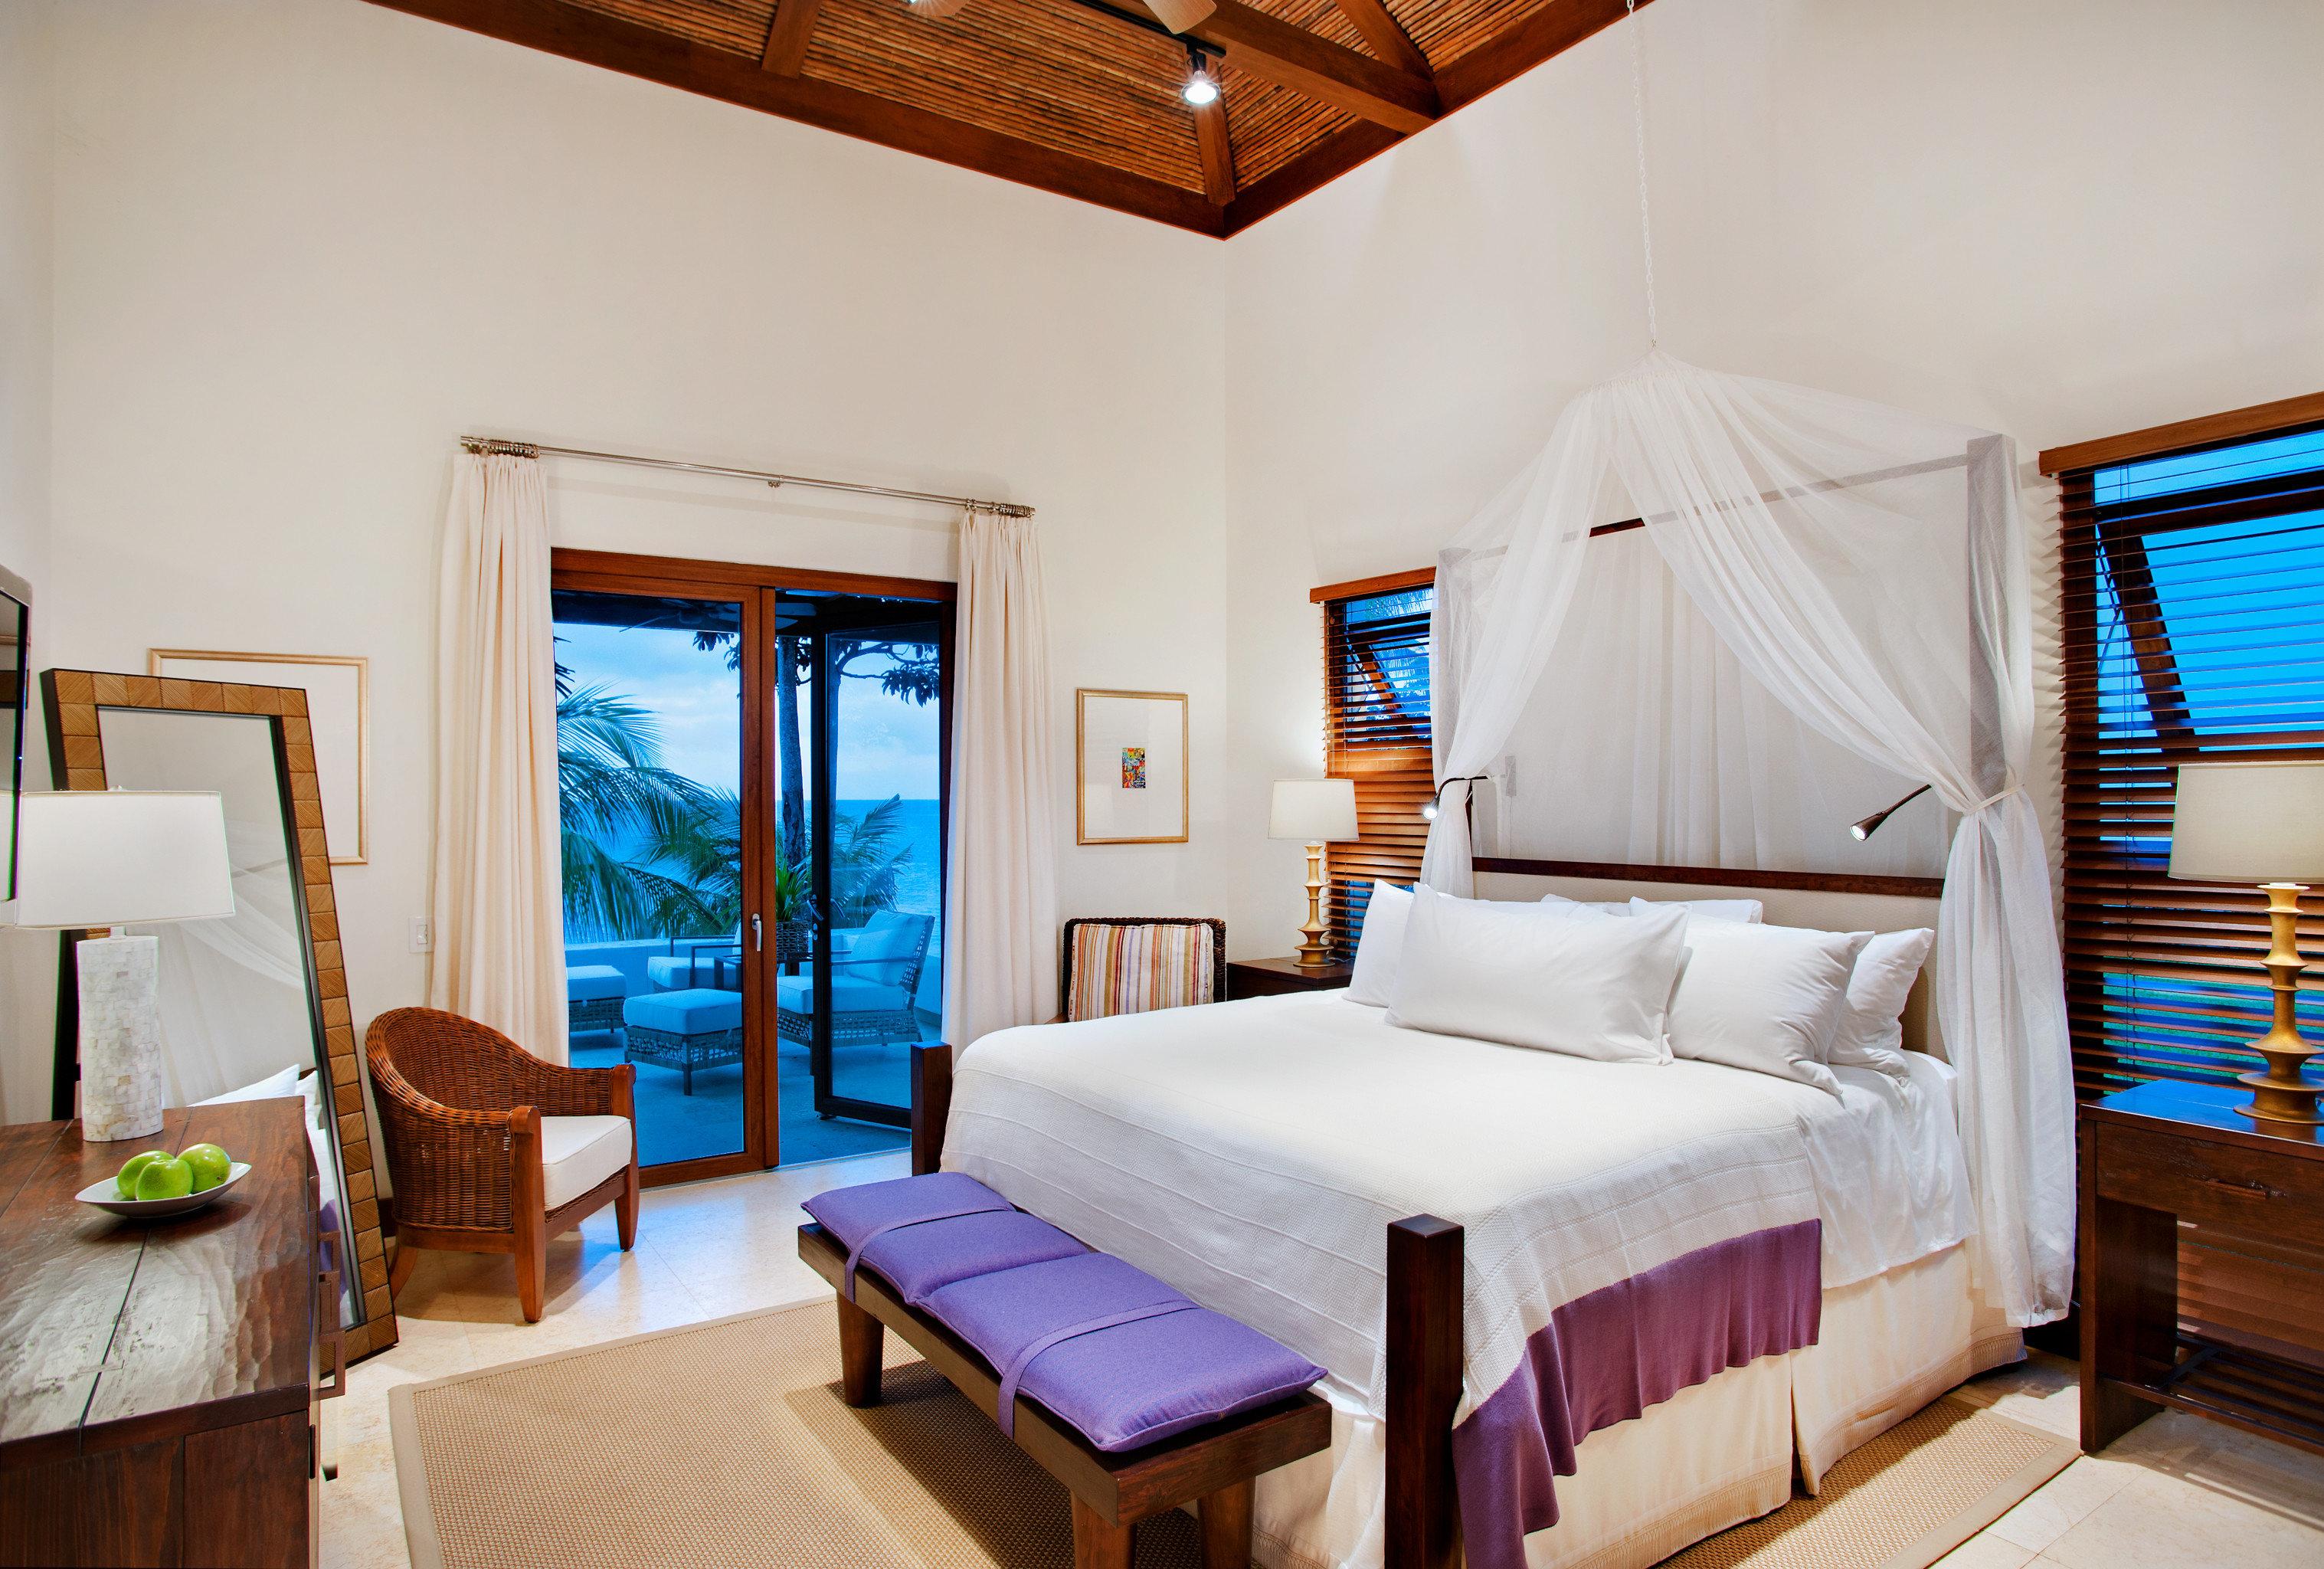 Balcony Bedroom Classic Eco Island Romance Scenic views Waterfront property Resort Suite Villa cottage living room